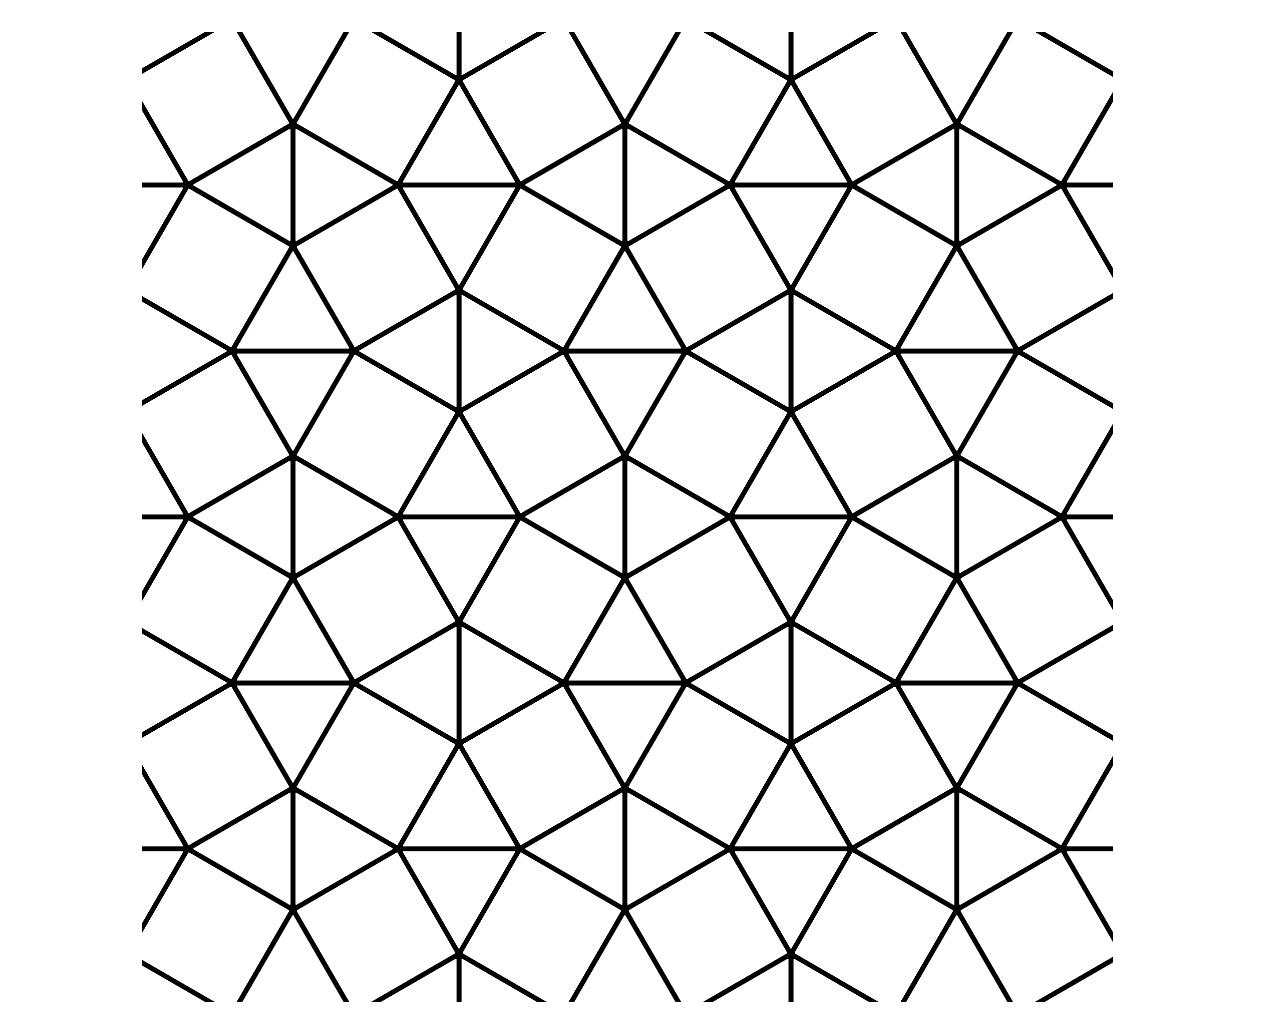 tessellation templates tessellation clipart etc tessellation templates